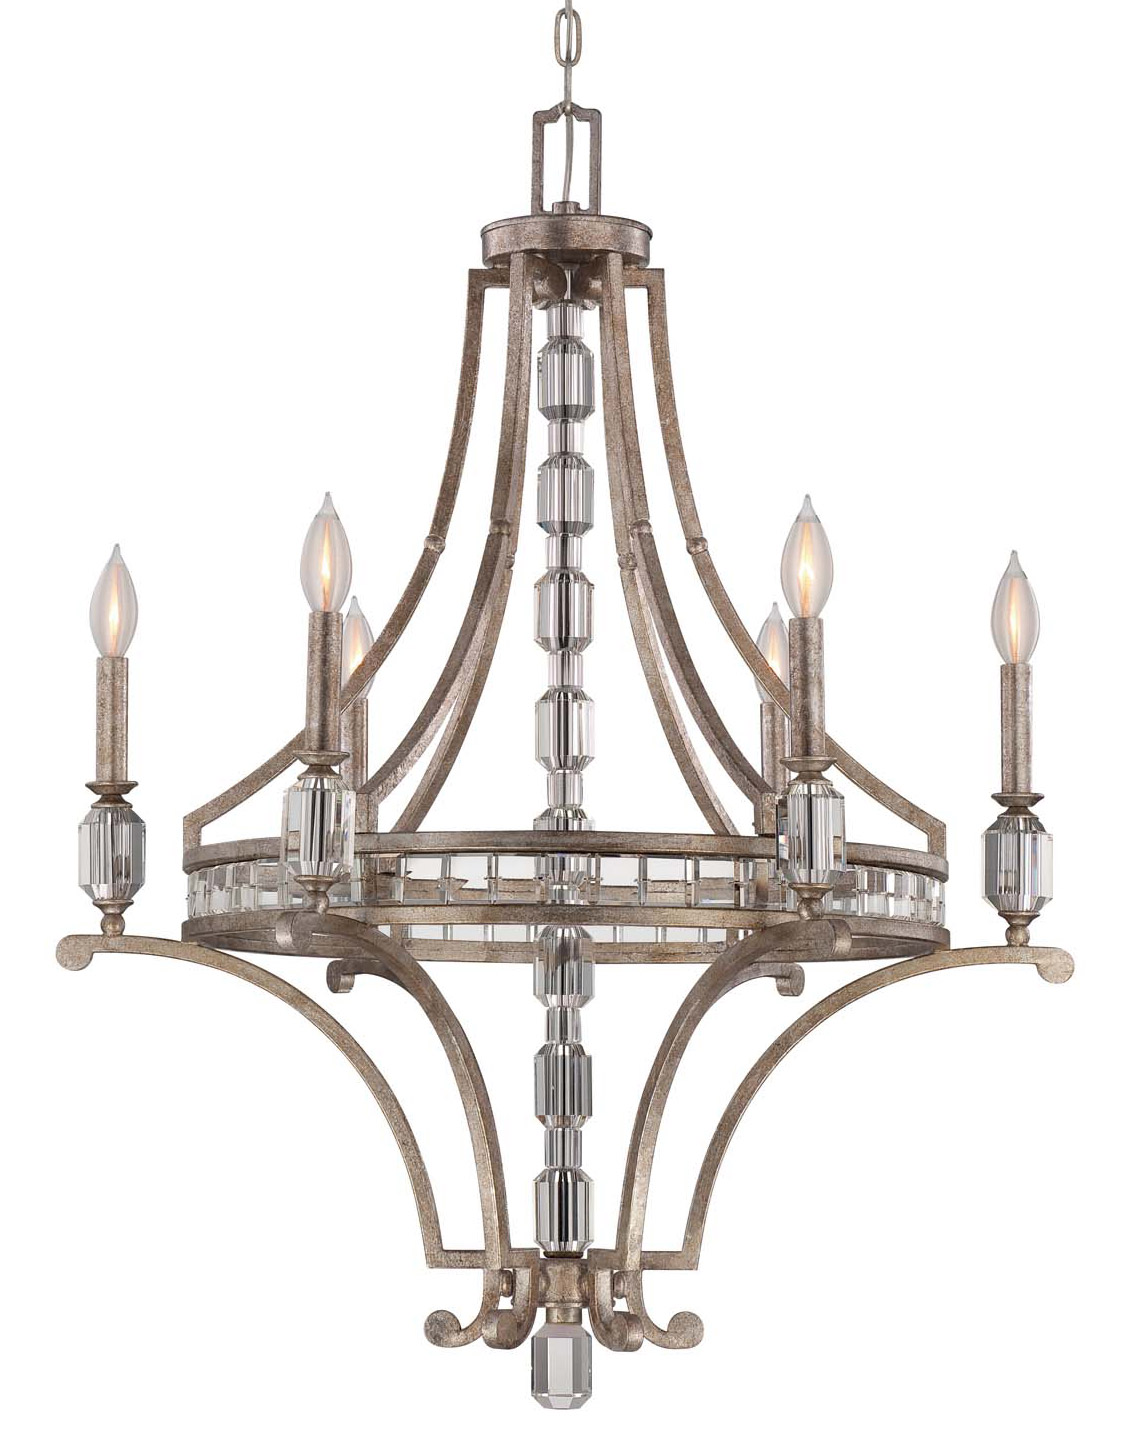 House 1 7151 6 272 filament 6 light chandelier savoy house 1 7151 6 272 filament 6 light chandelier mozeypictures Images